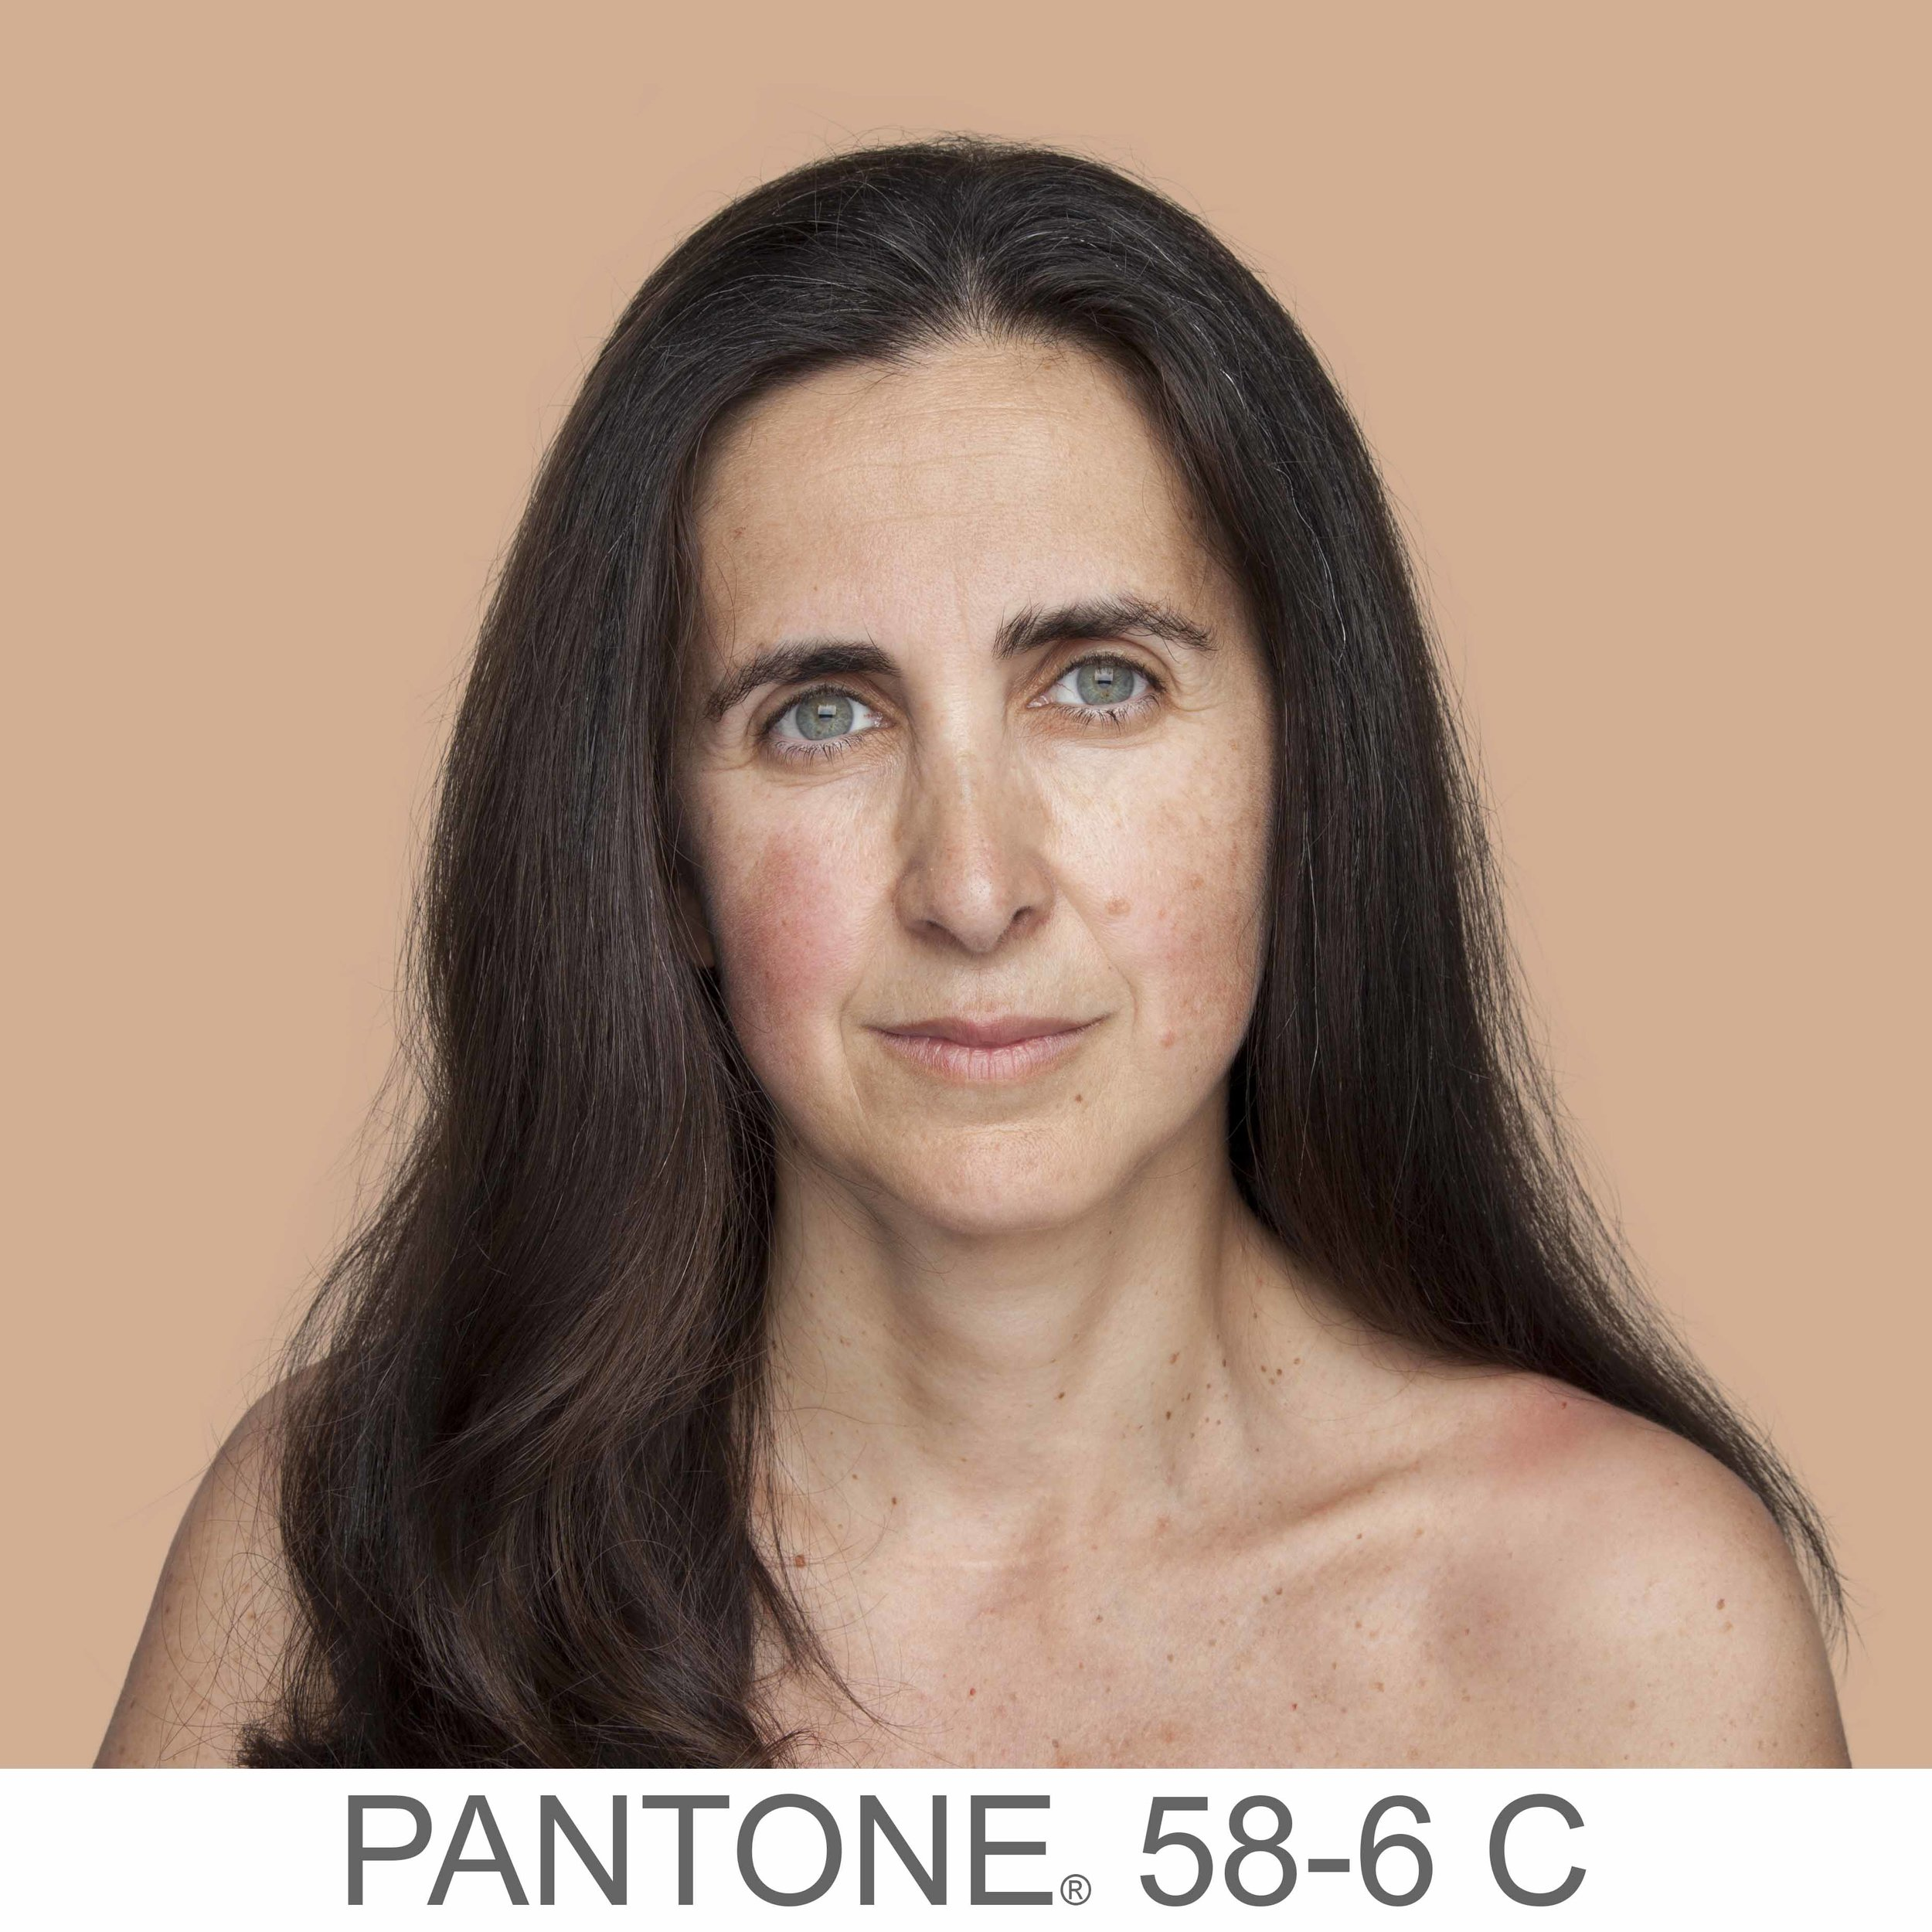 Humanae-Angelica-dass-115.jpg